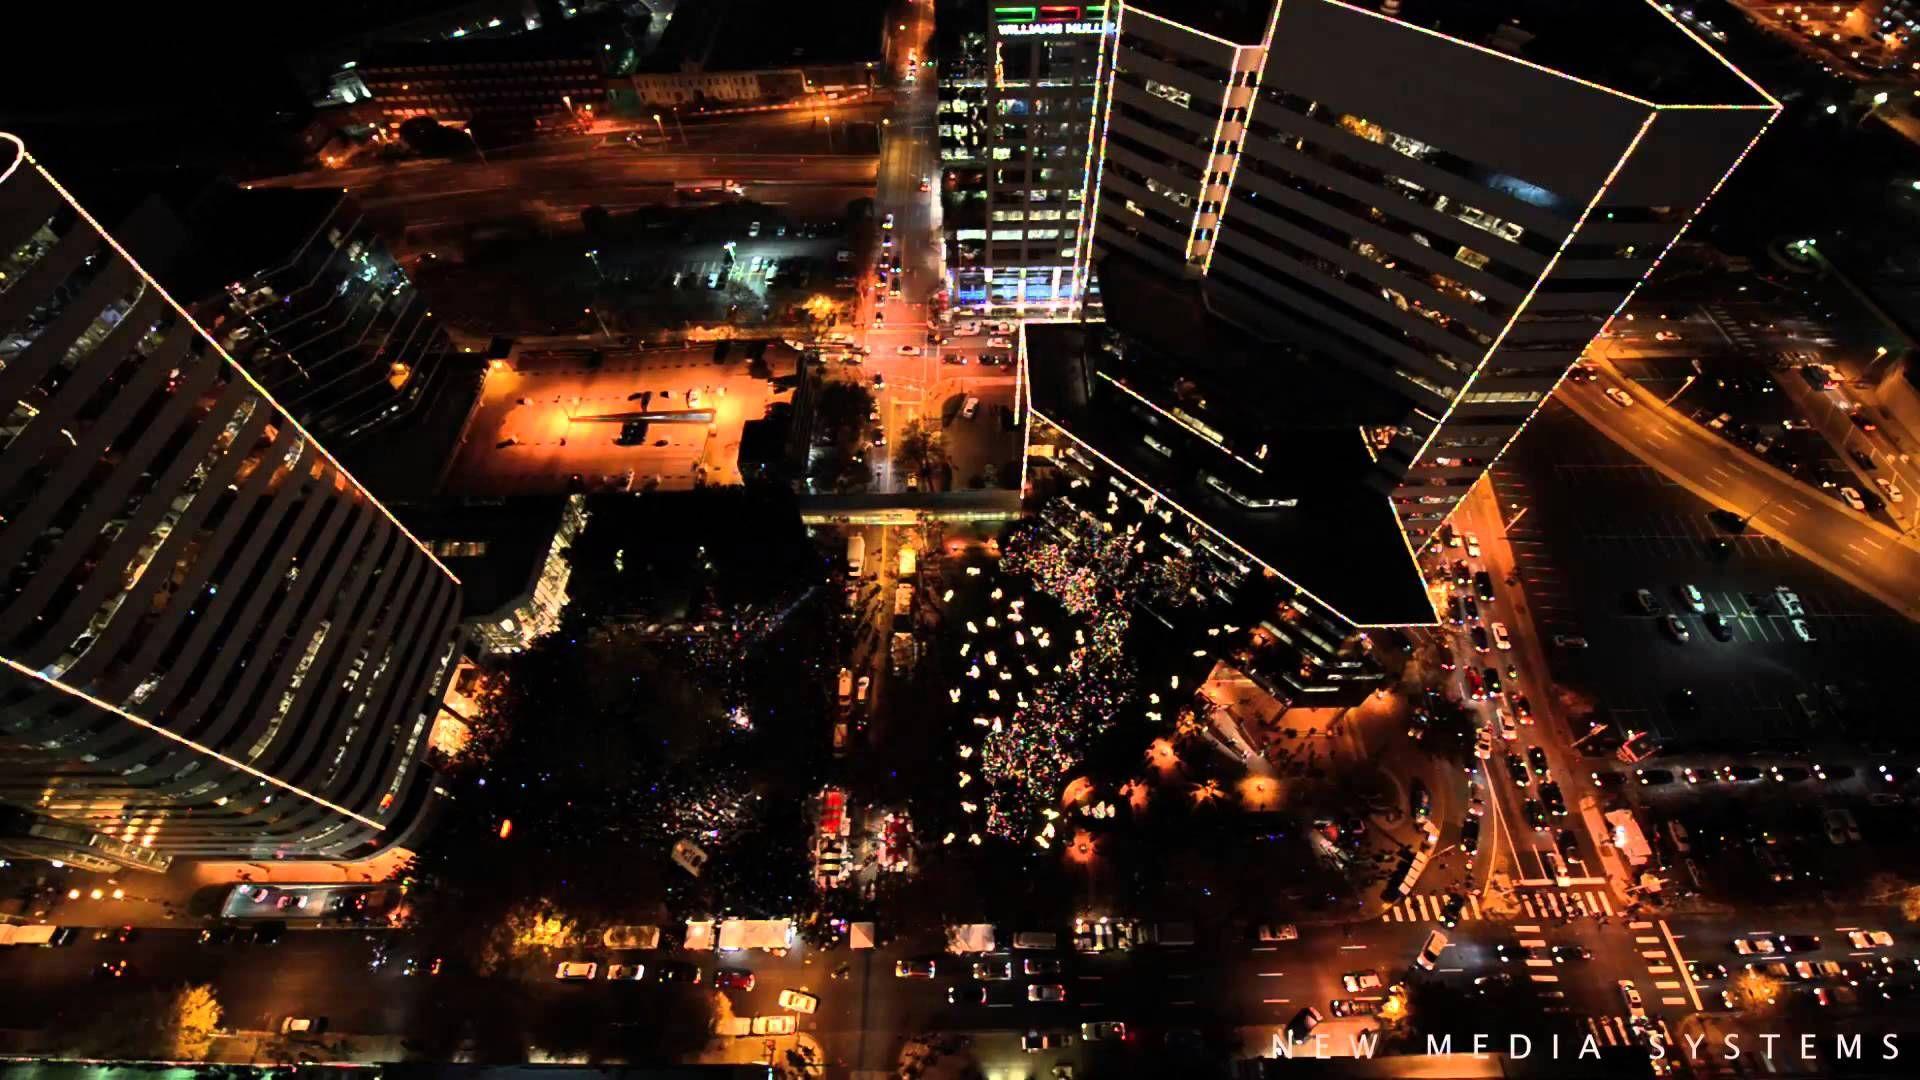 Grand illumination 2012 james center richmond virginia